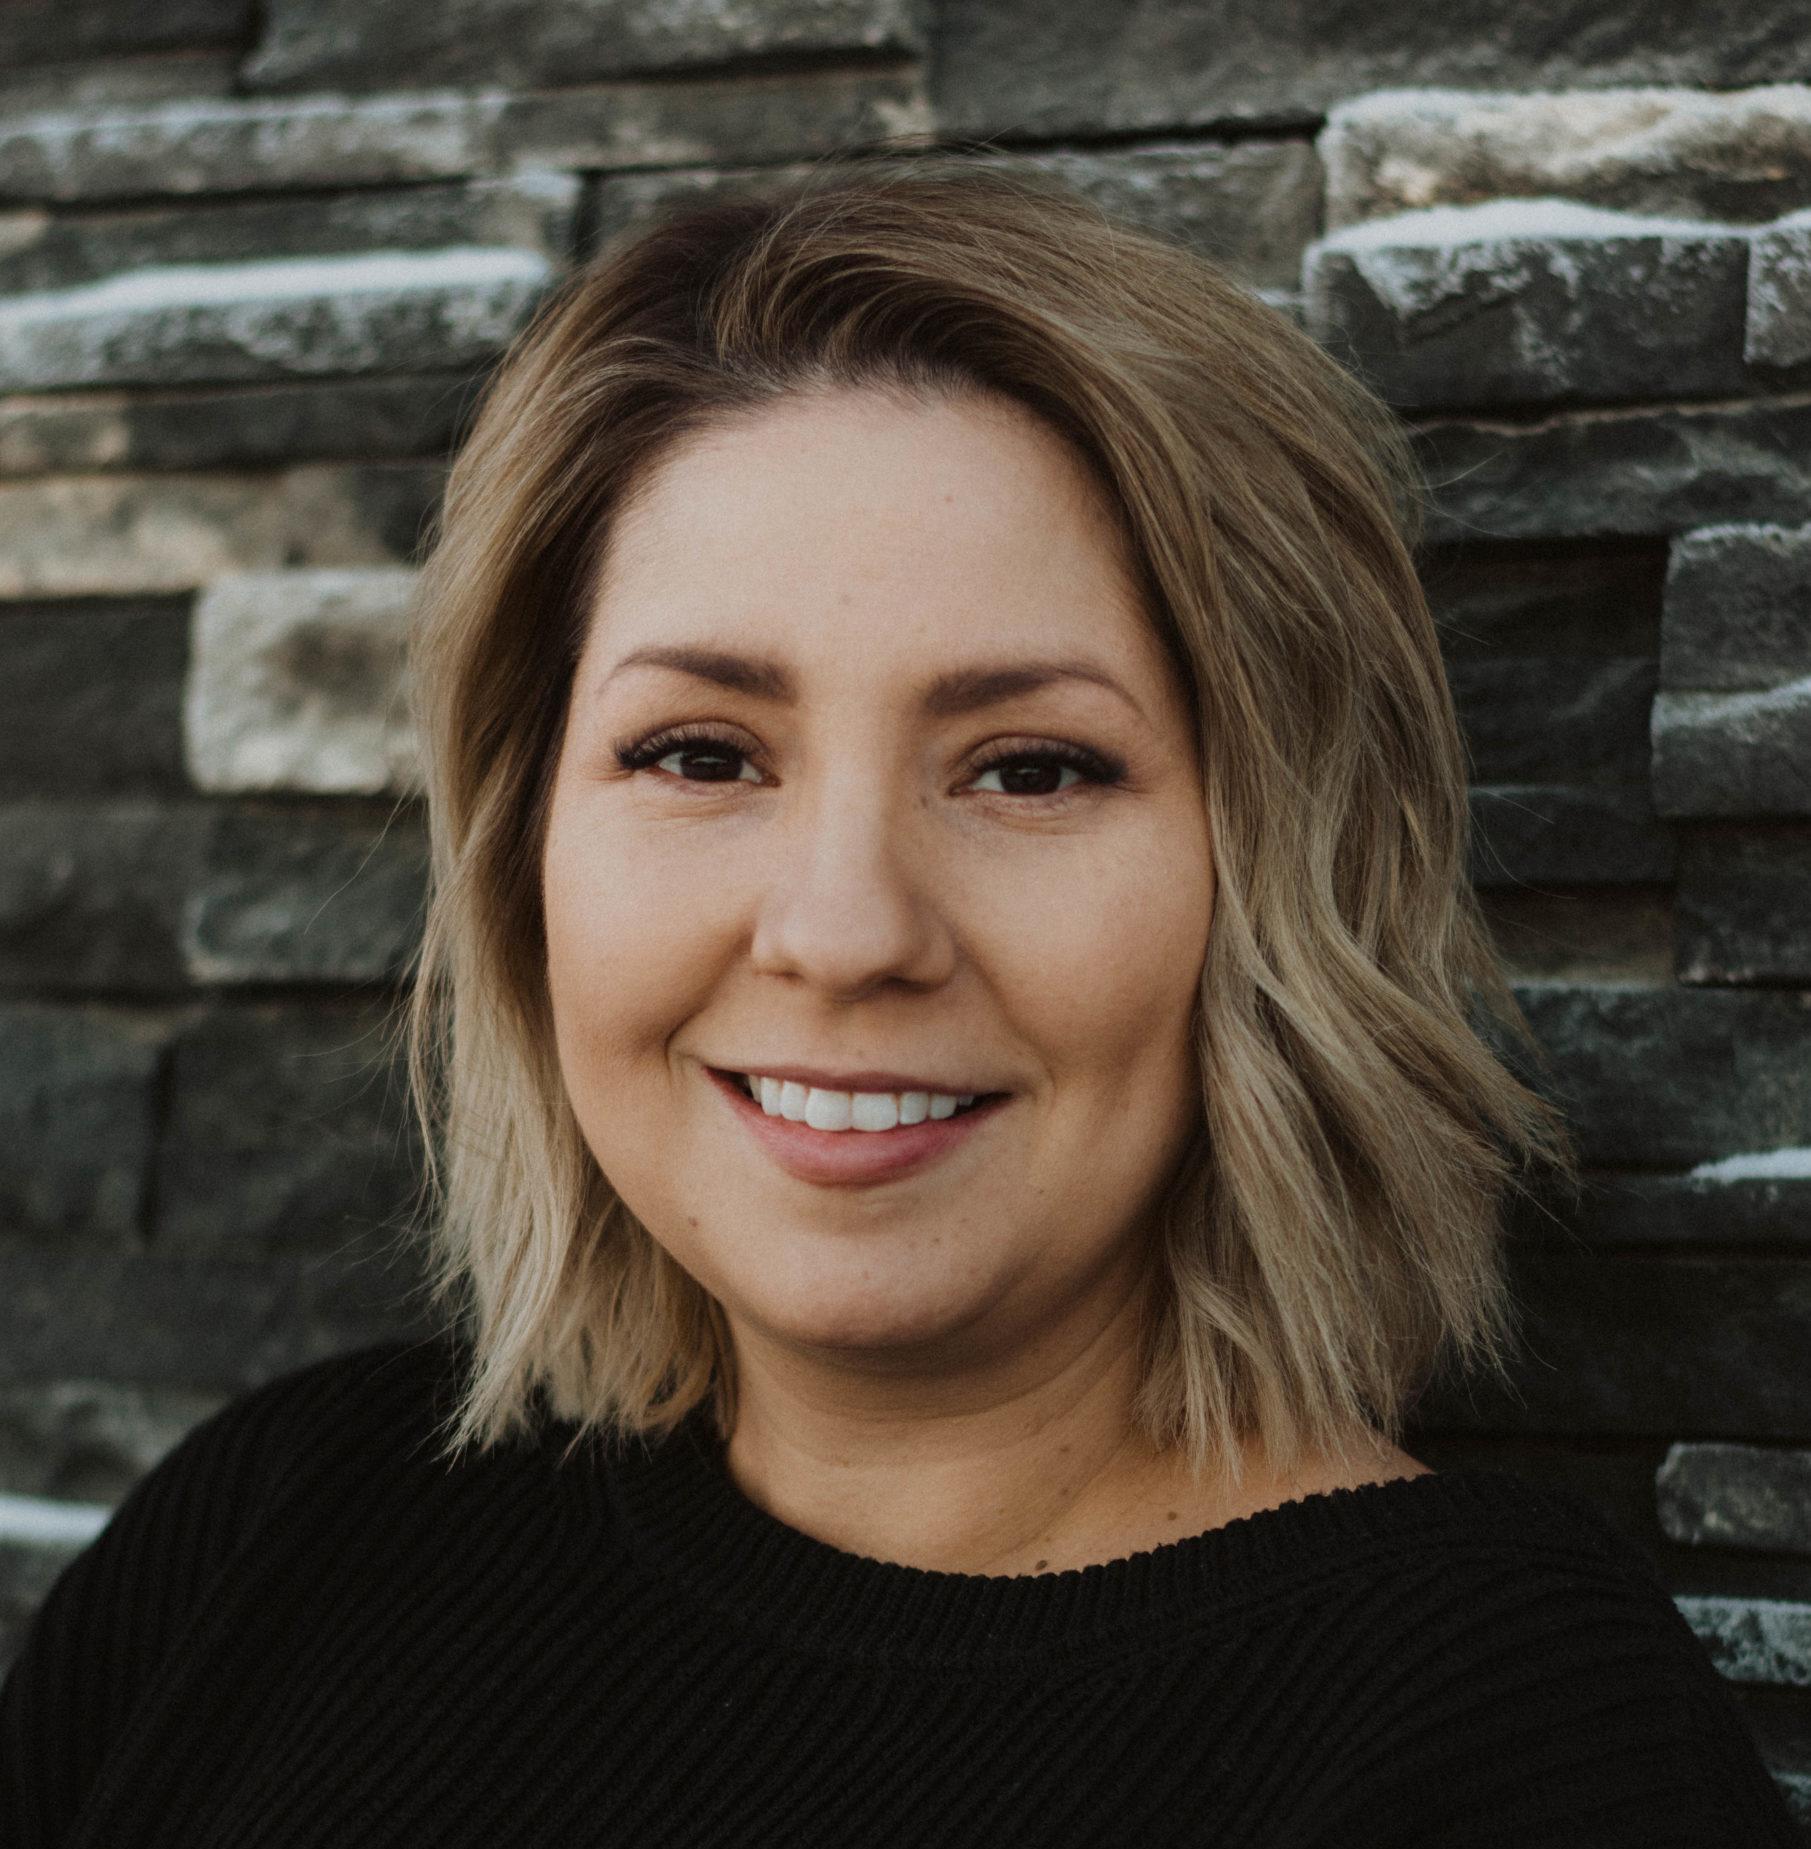 Angela Barrette of Stillpoint Integrative Holistic Medicine in Fort Saint John, BC Canada